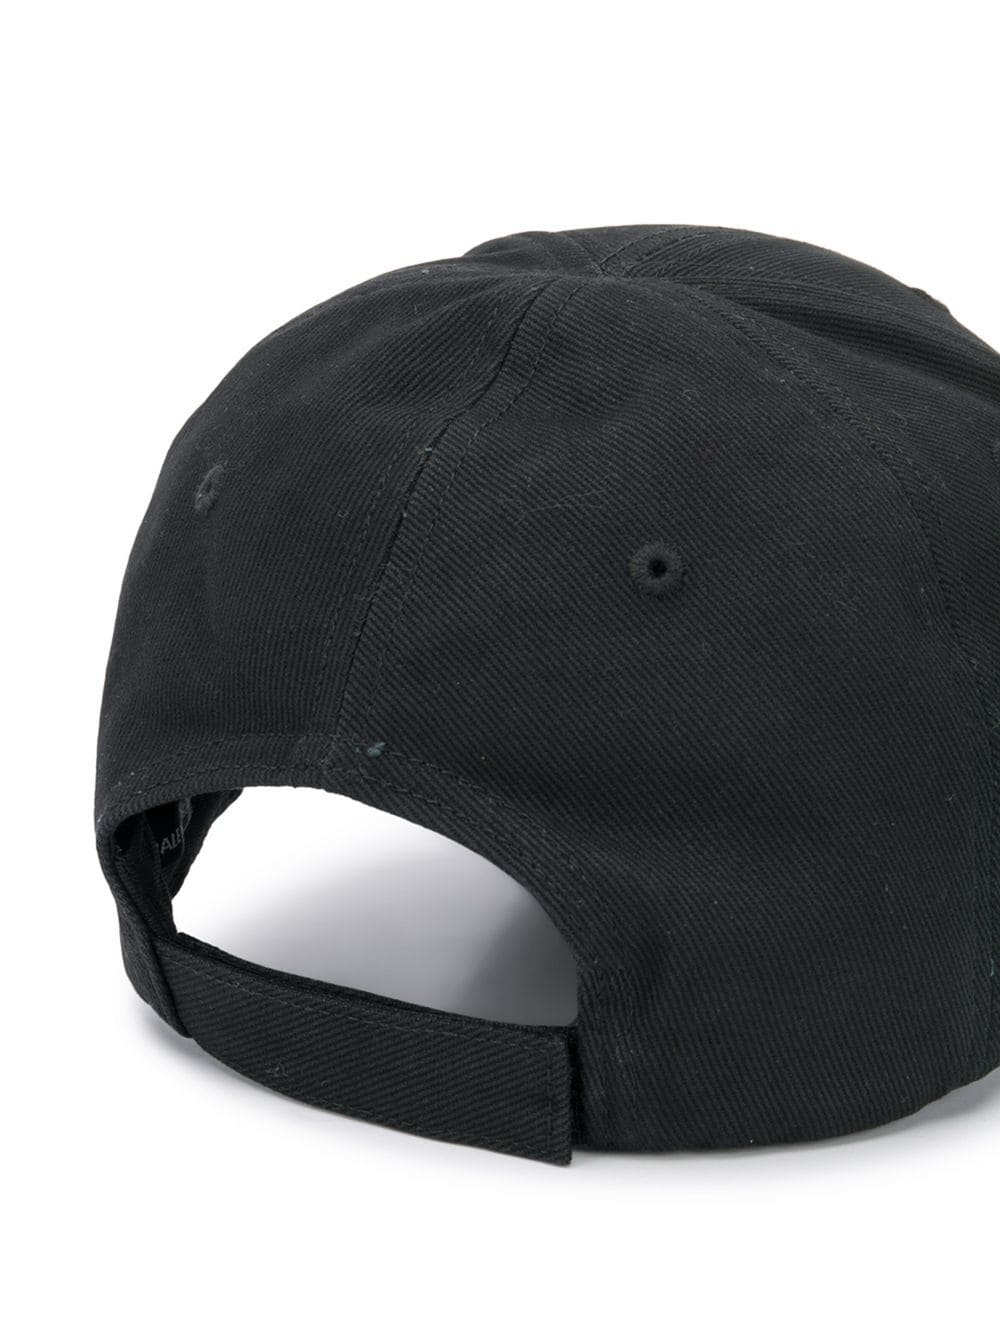 cff03d0150bc8 Black Baseball Hat With Multicolored Logo - BALENCIAGA - Russocapri